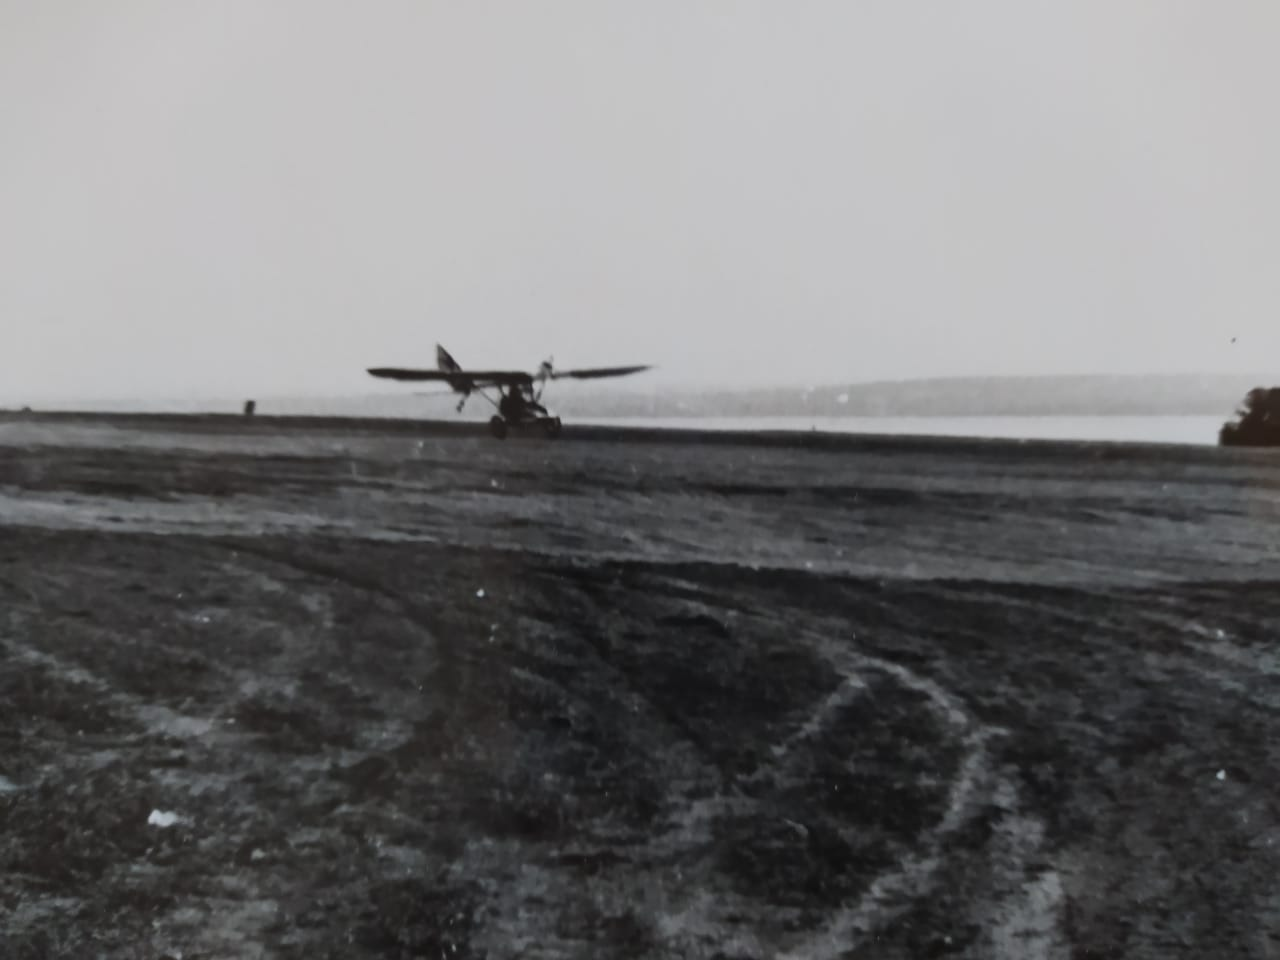 AFFR4321.JPG